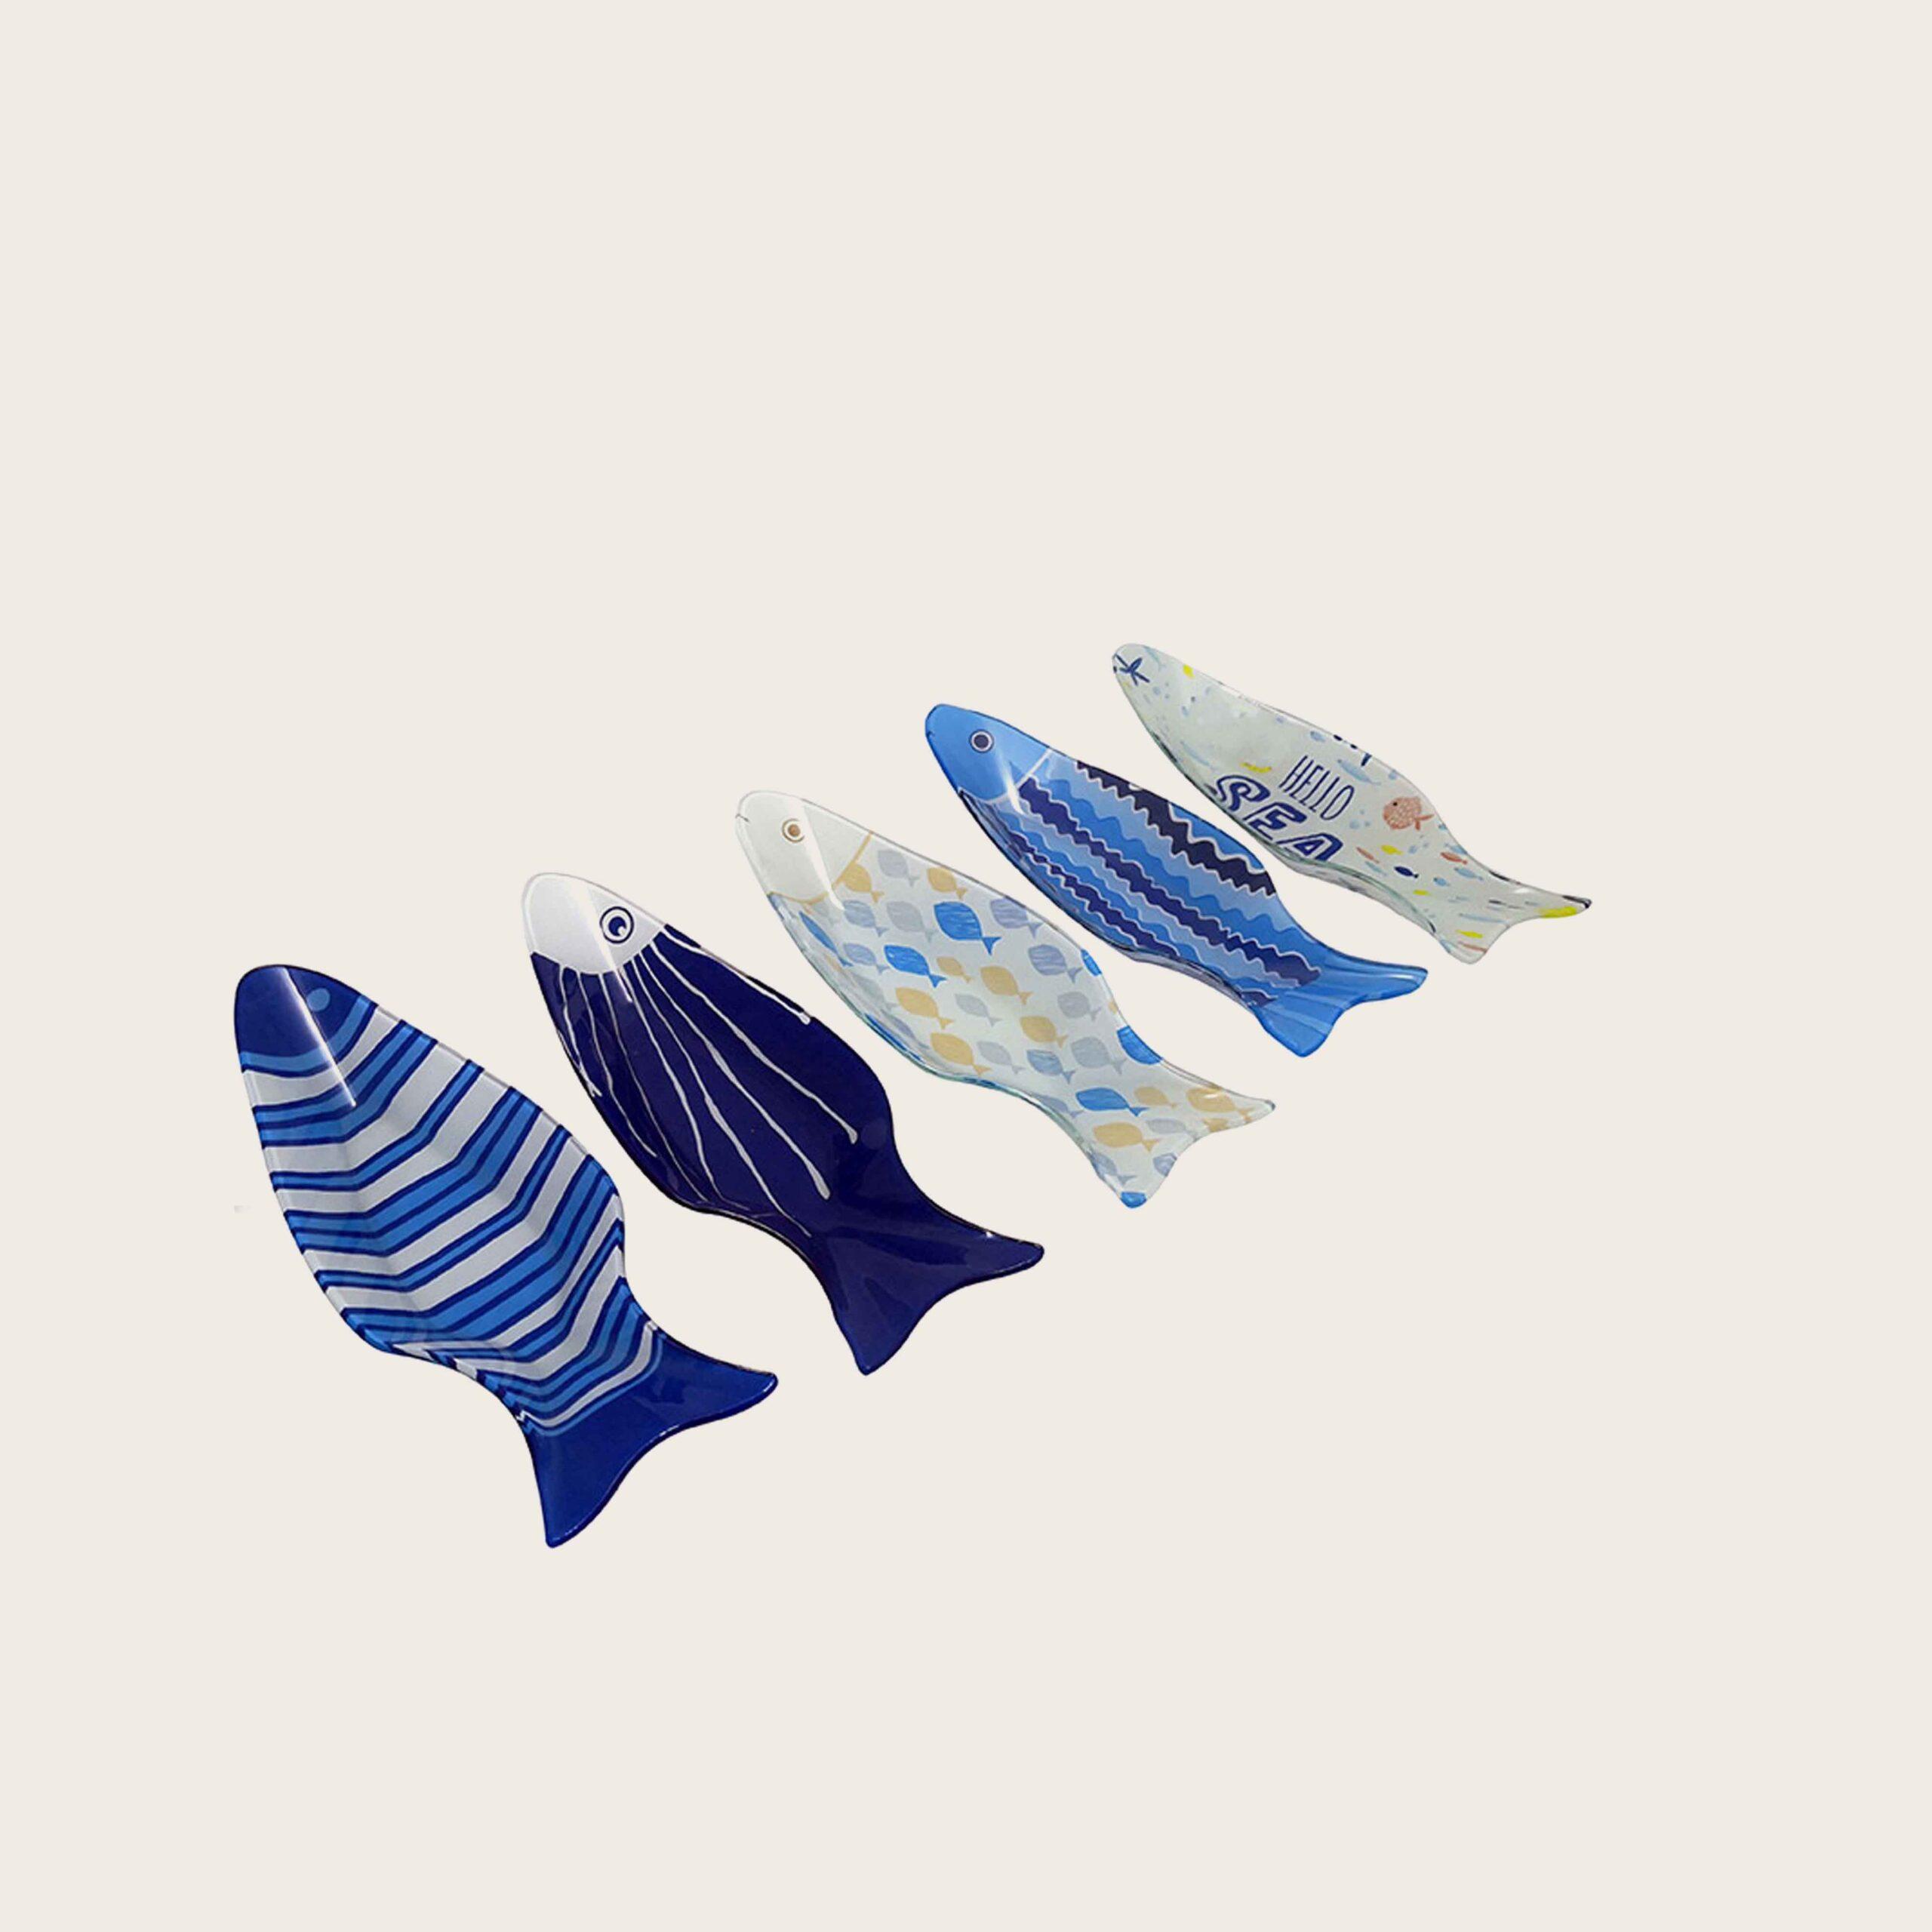 Ciotola forma pesce in vetro cm.9.5x26x3.5 - fantasia fish